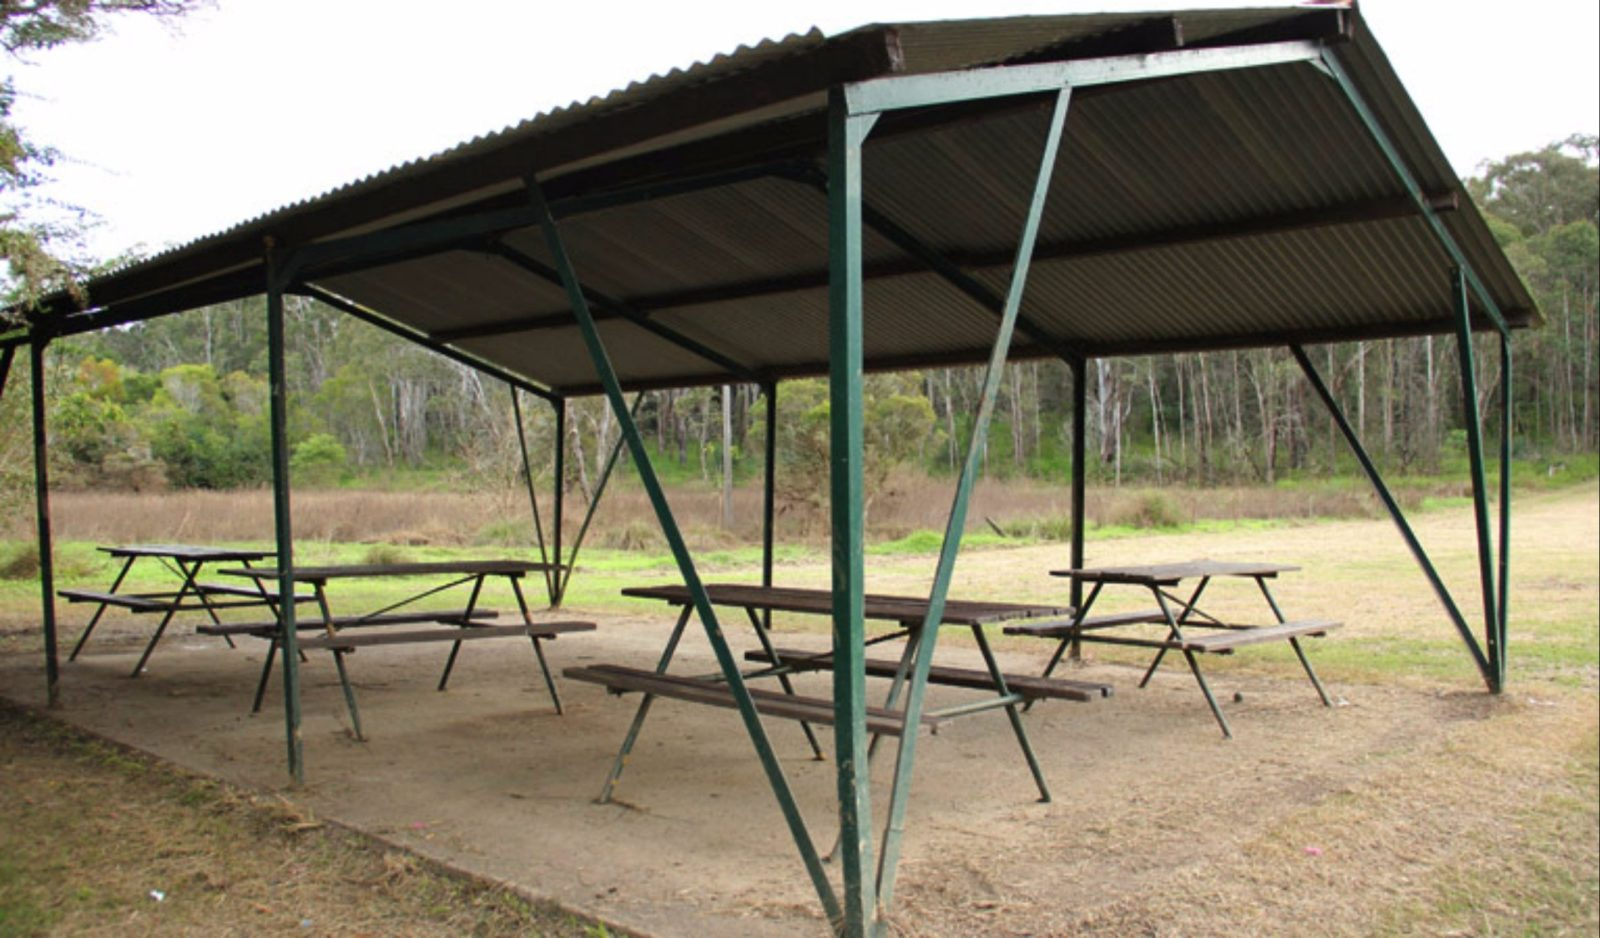 Mitchell Park picnic area